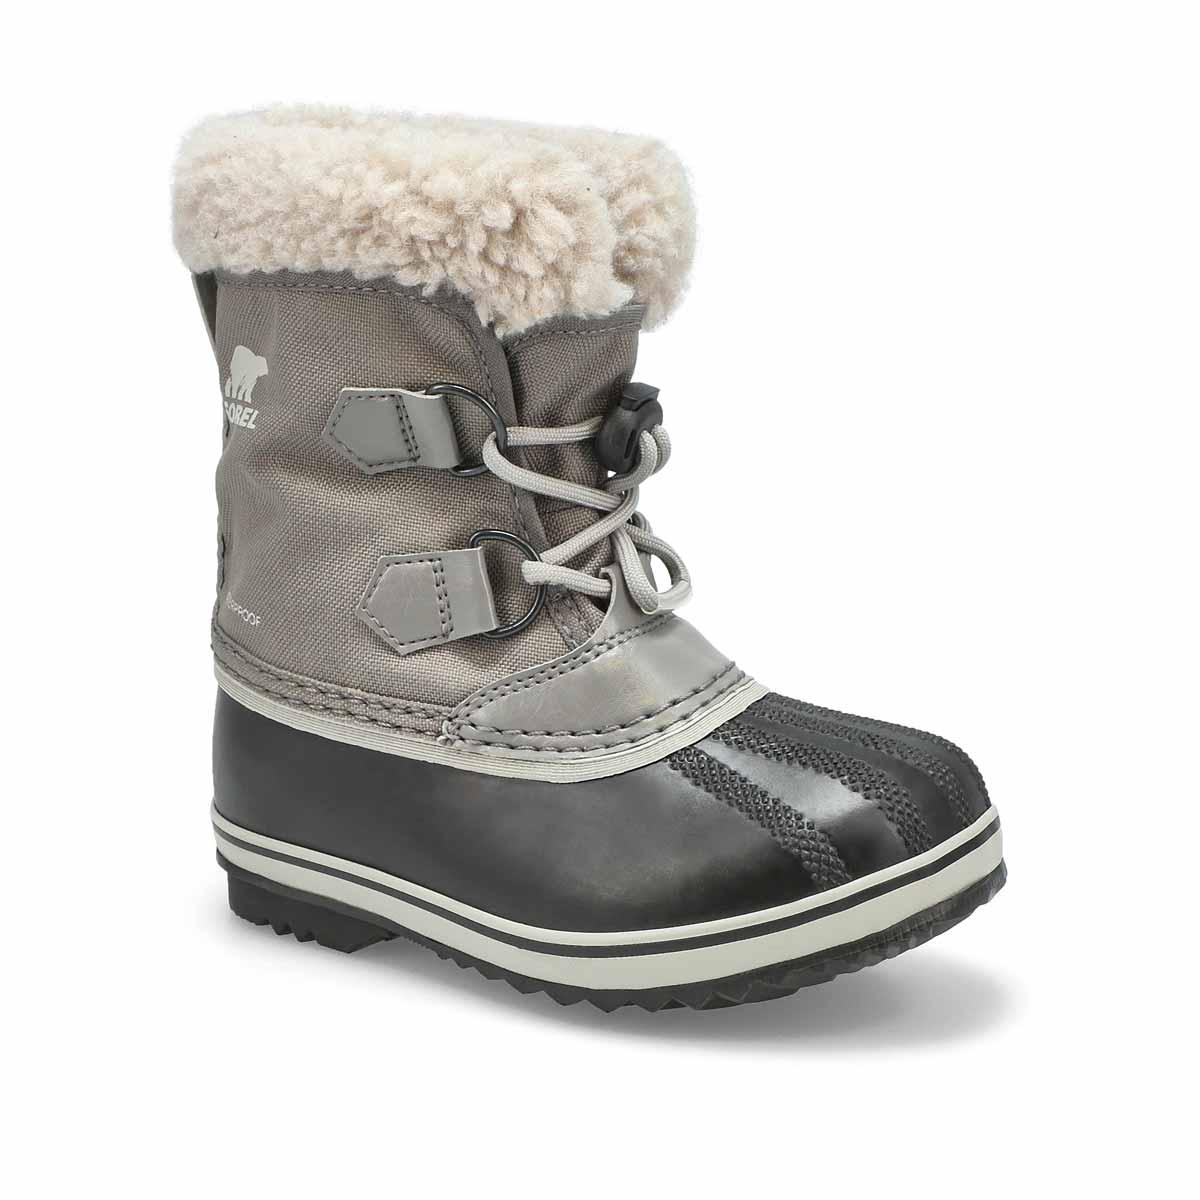 Kds Yoot Pac Nylon qry wtpf snow boot